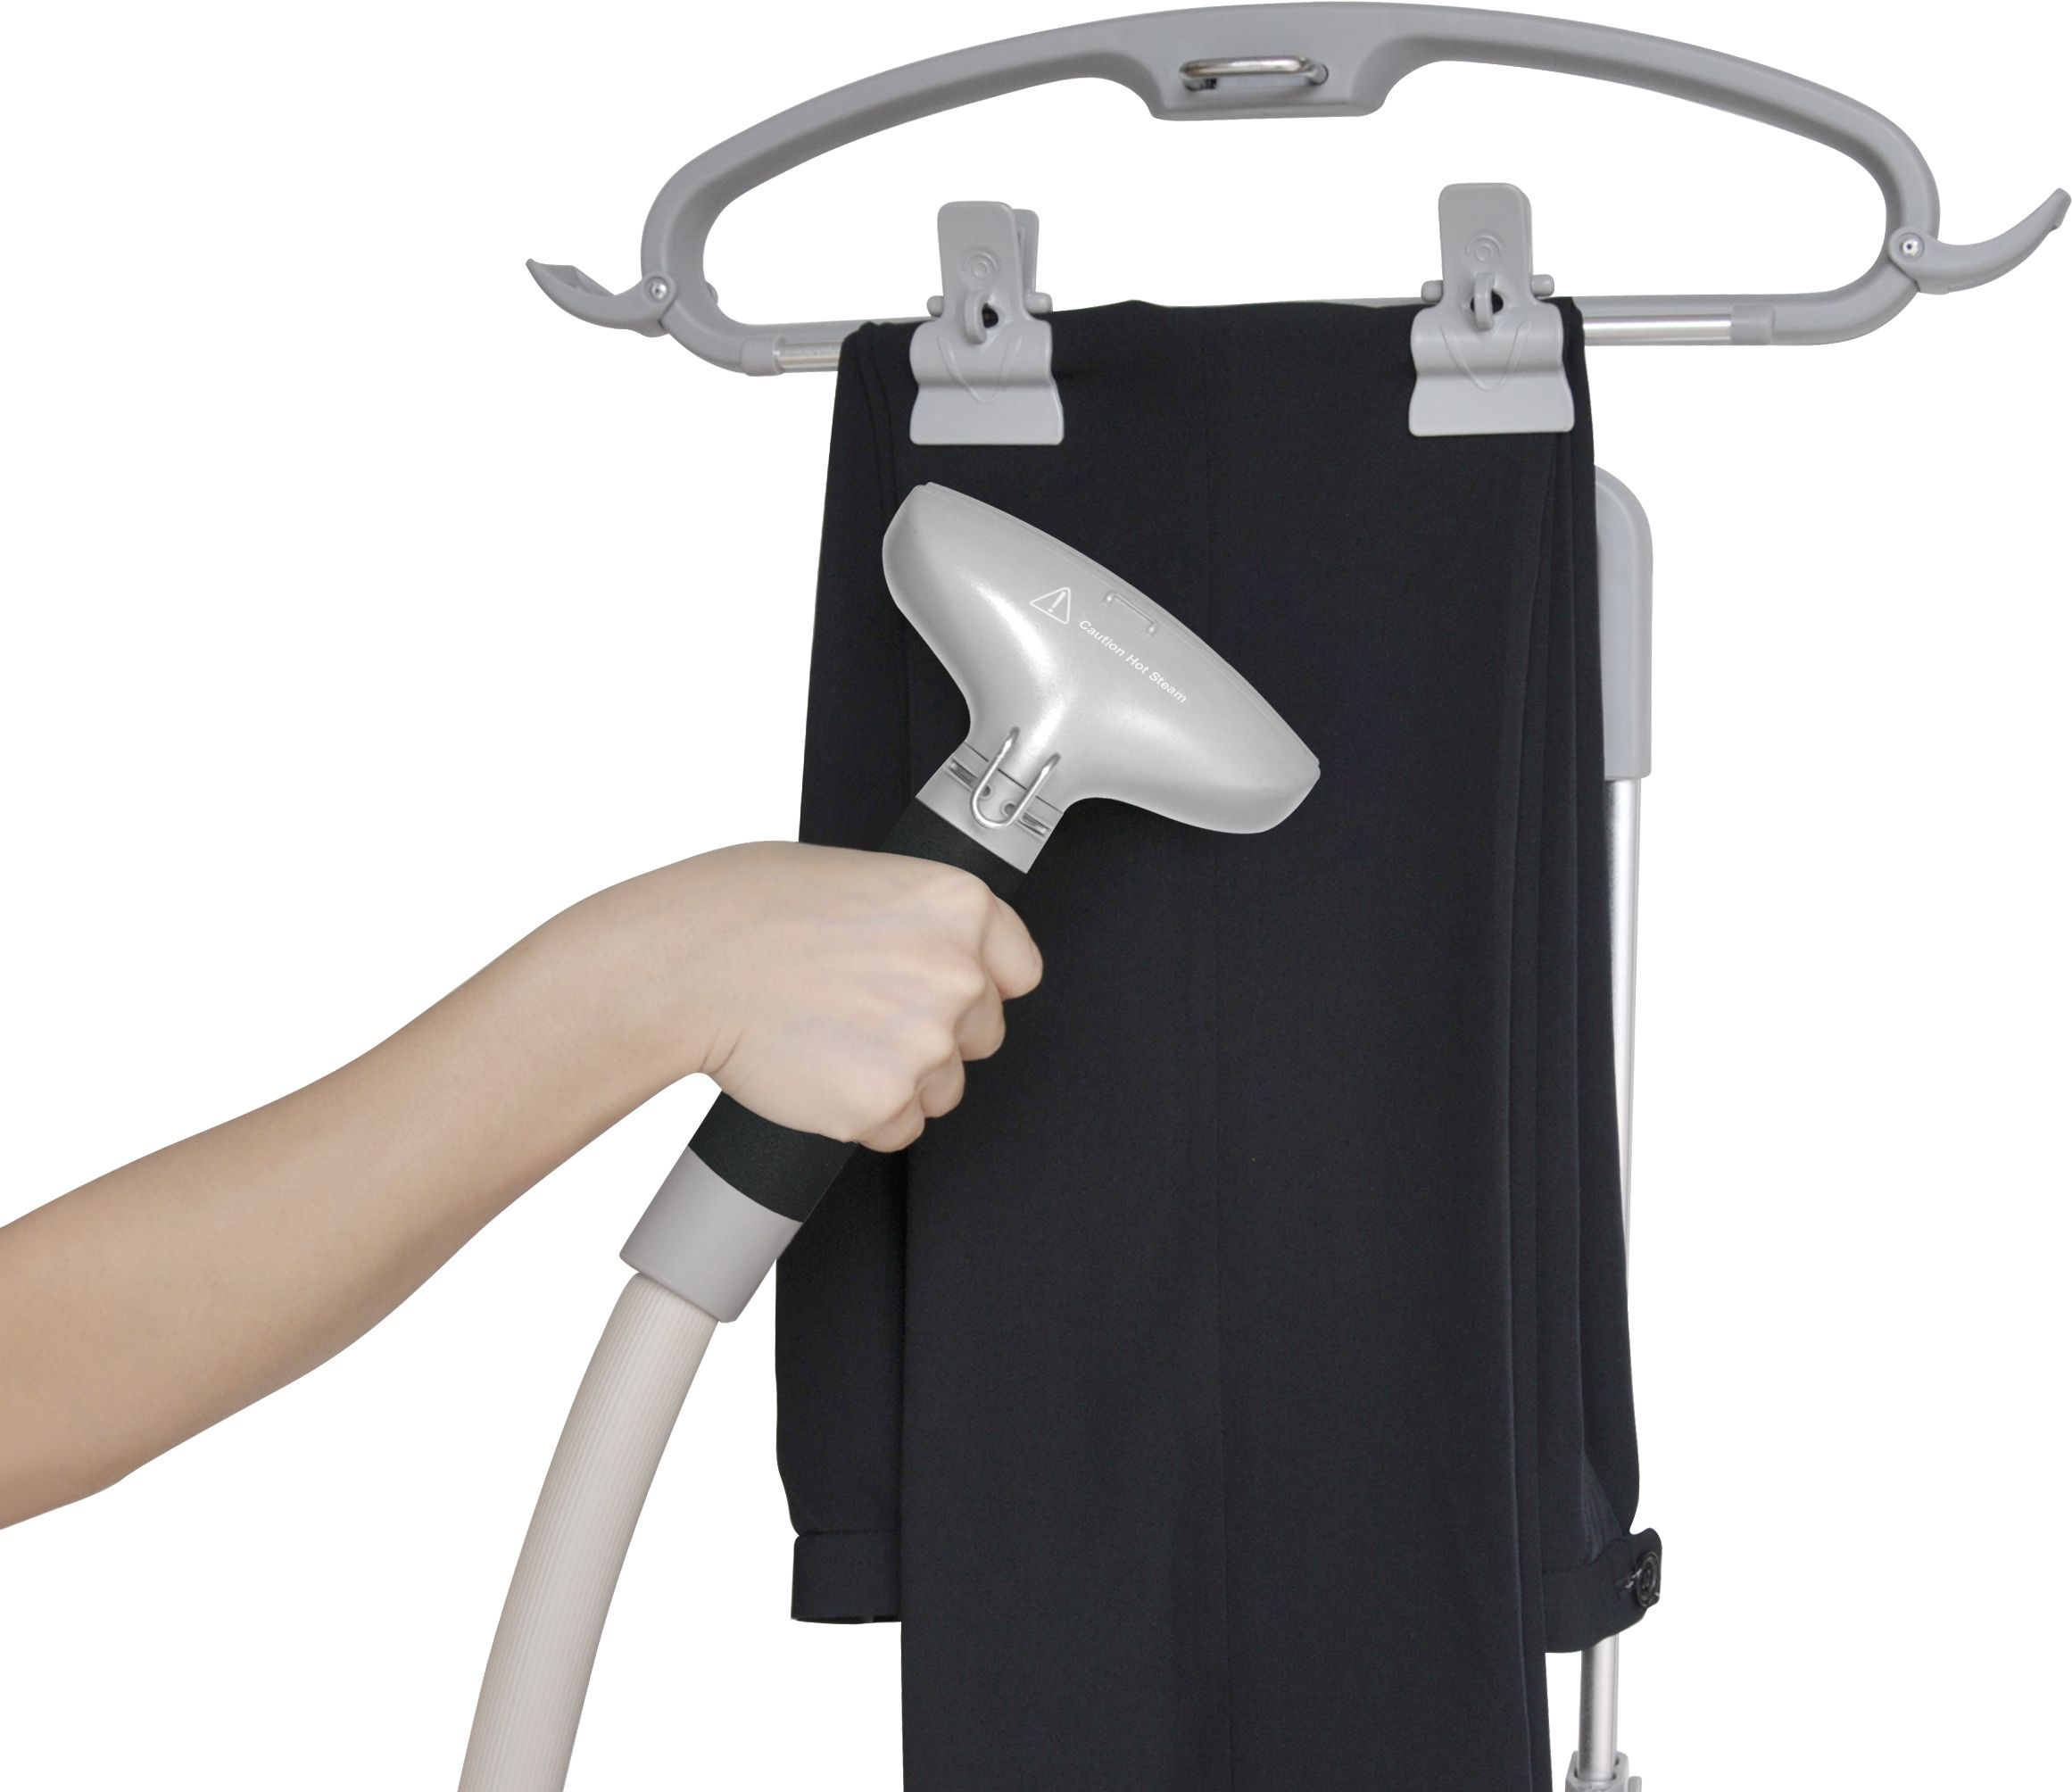 Gs45 Dj Dual Bar Professional Garment Steamer By Salav